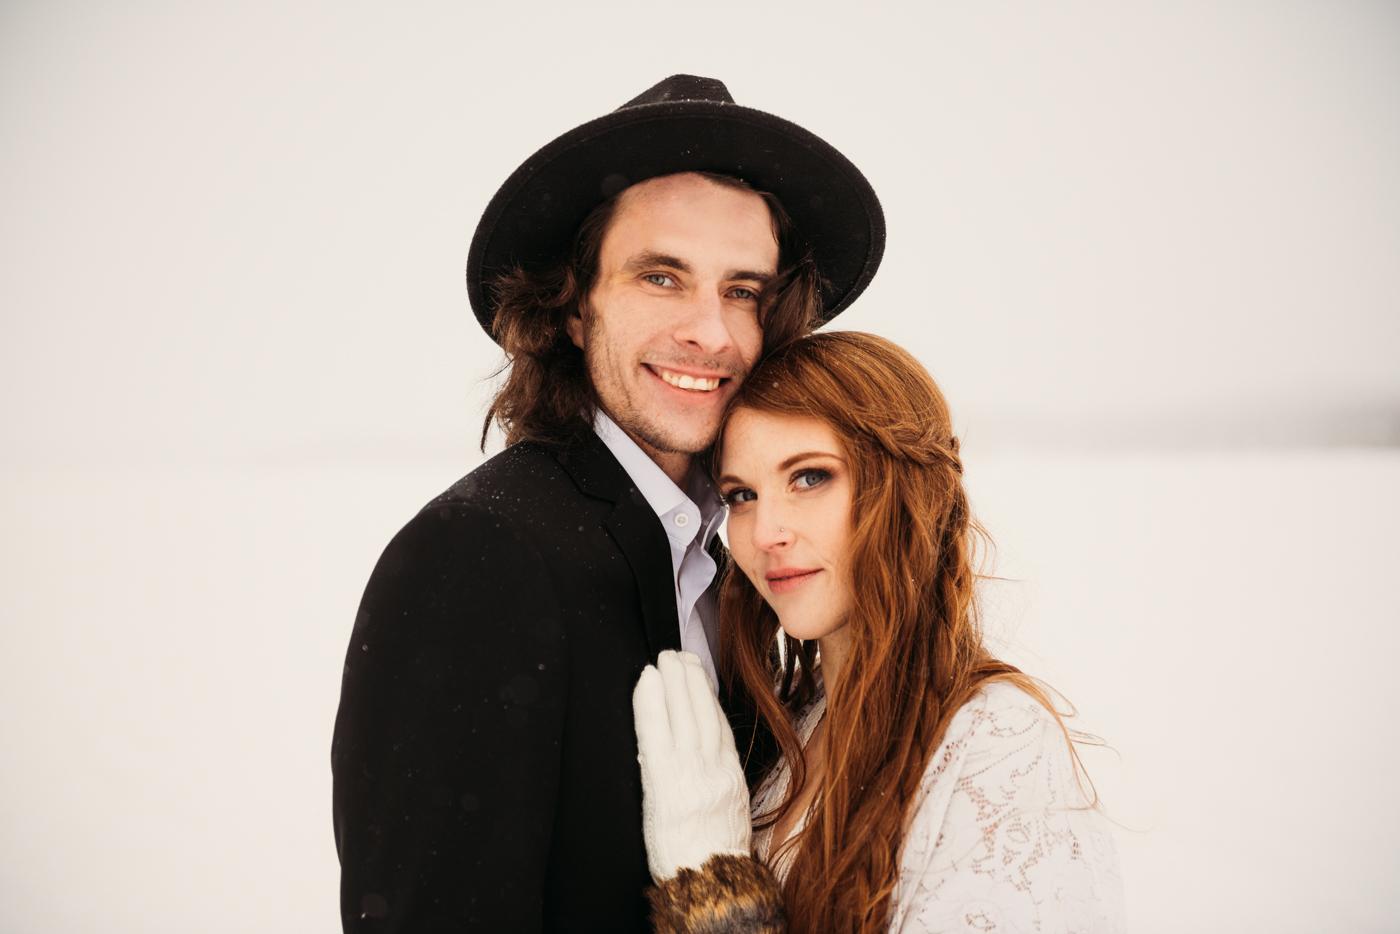 FortSt.John_photographer_TyraEPhotography_Wedding_Couple_Family_Photograhy_DawsonCreek_Elopement_Bride_Boduoir_Portraits--3.jpg